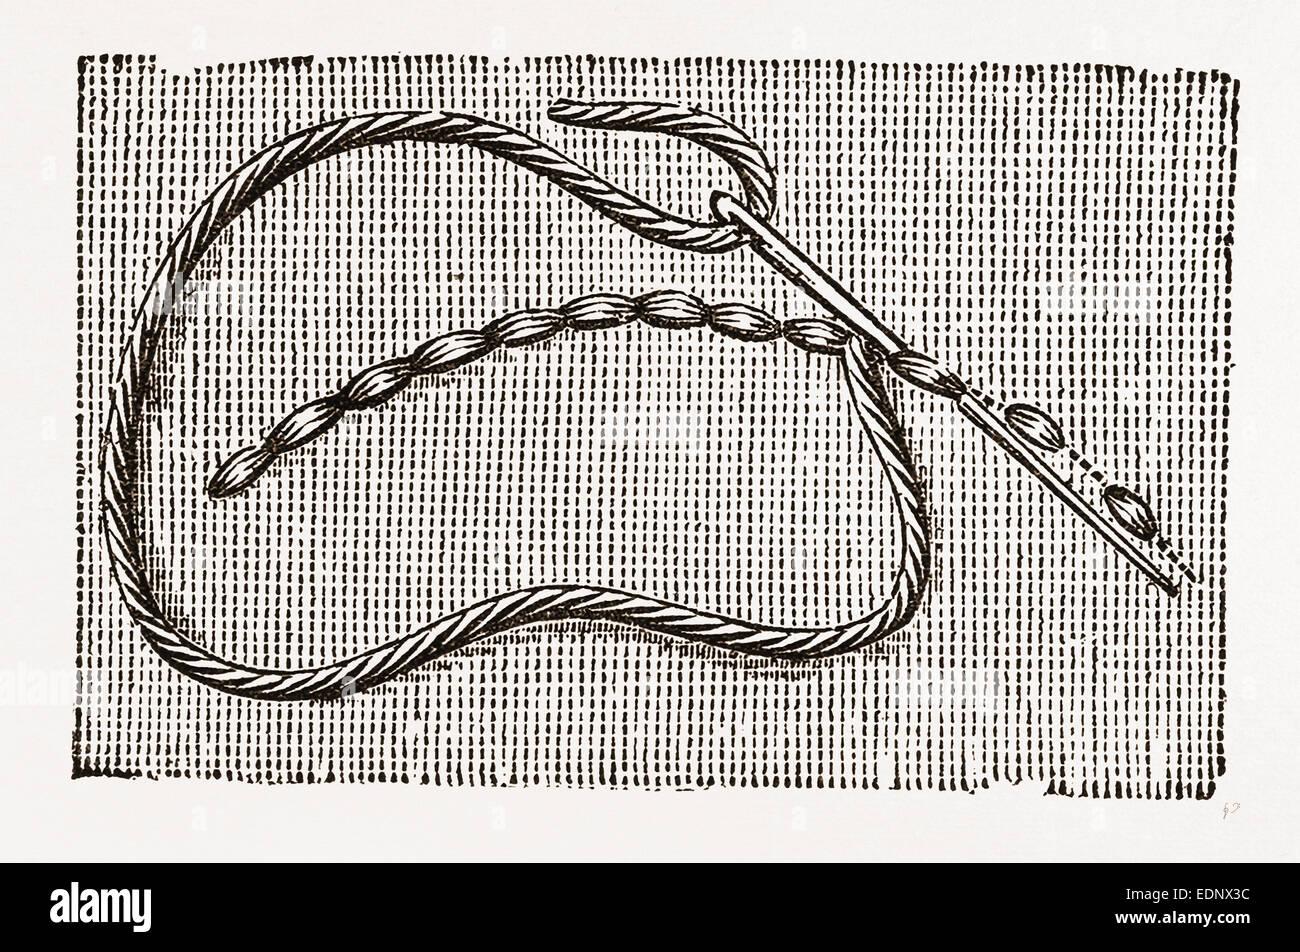 NEEDLEWORK, 19th CENTURY EMBROIDERY - Stock Image